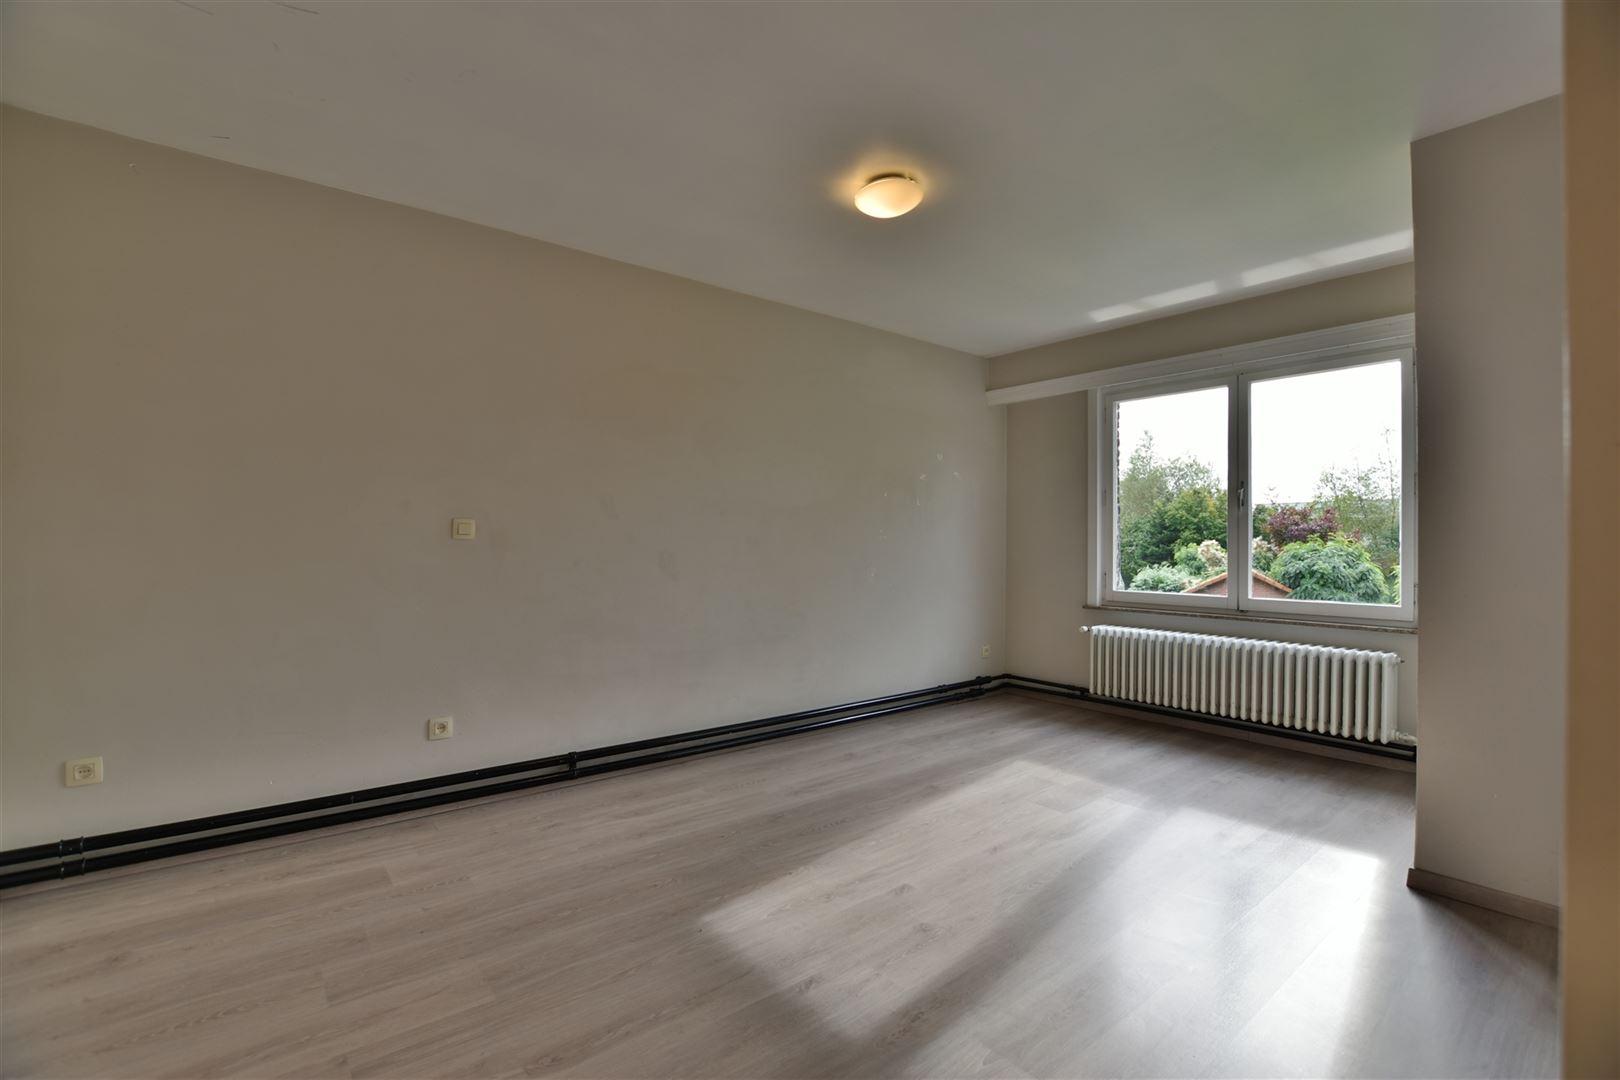 Foto 11 : Woning te 9100 SINT-NIKLAAS (België) - Prijs € 349.000